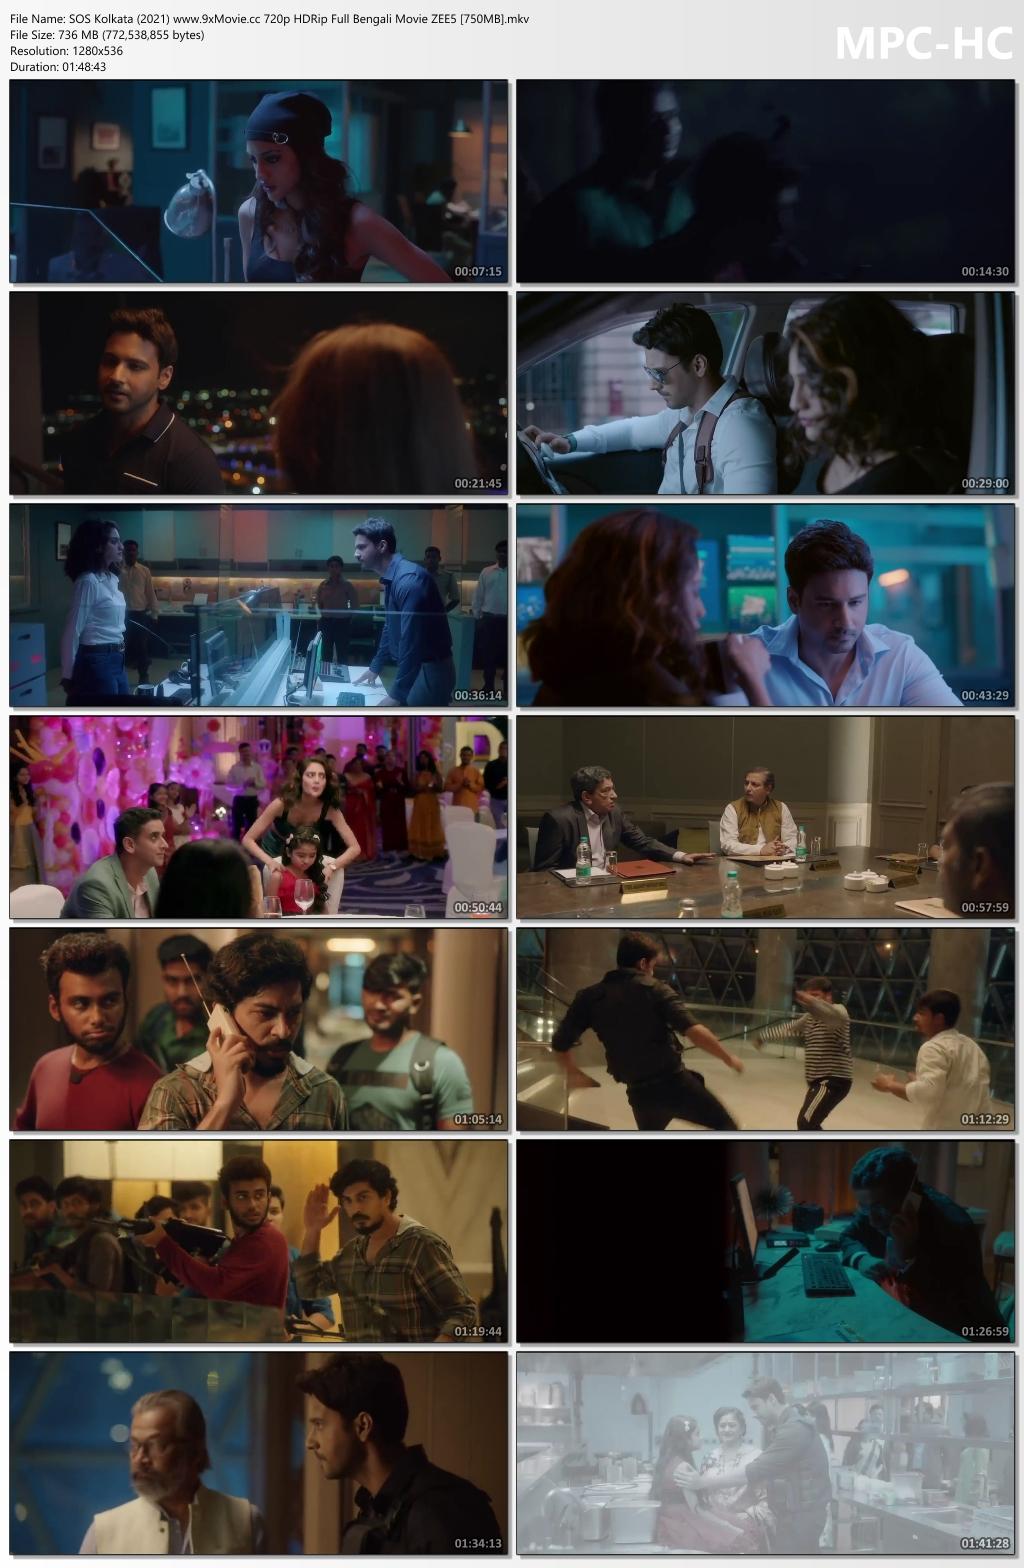 SOS-Kolkata-2021-www-9x-Movie-cc-720p-HDRip-Full-Bengali-Movie-ZEE5-750-MB-mkv